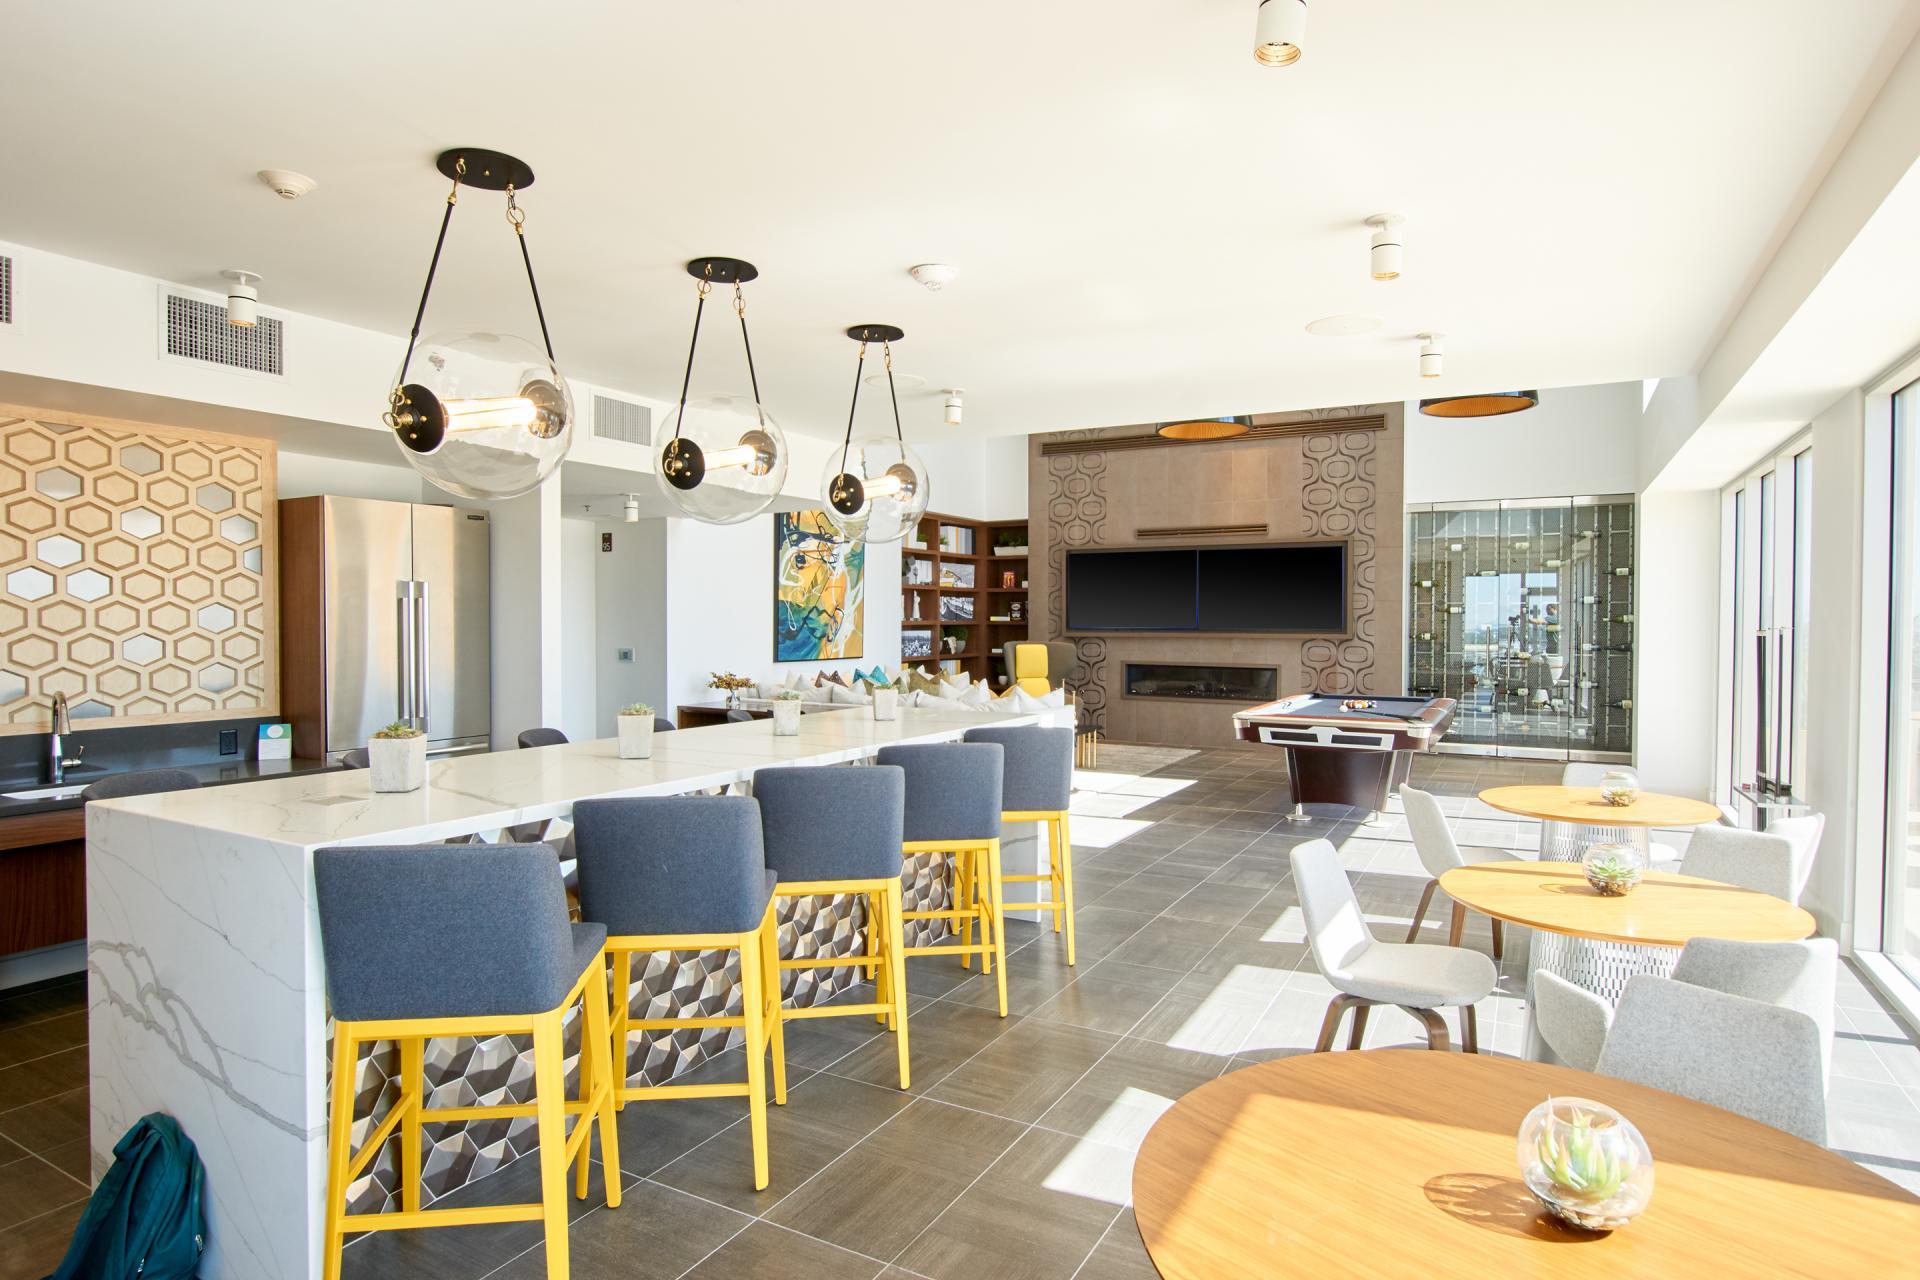 Communal space at McKinley Apartments, Center, Phoenix